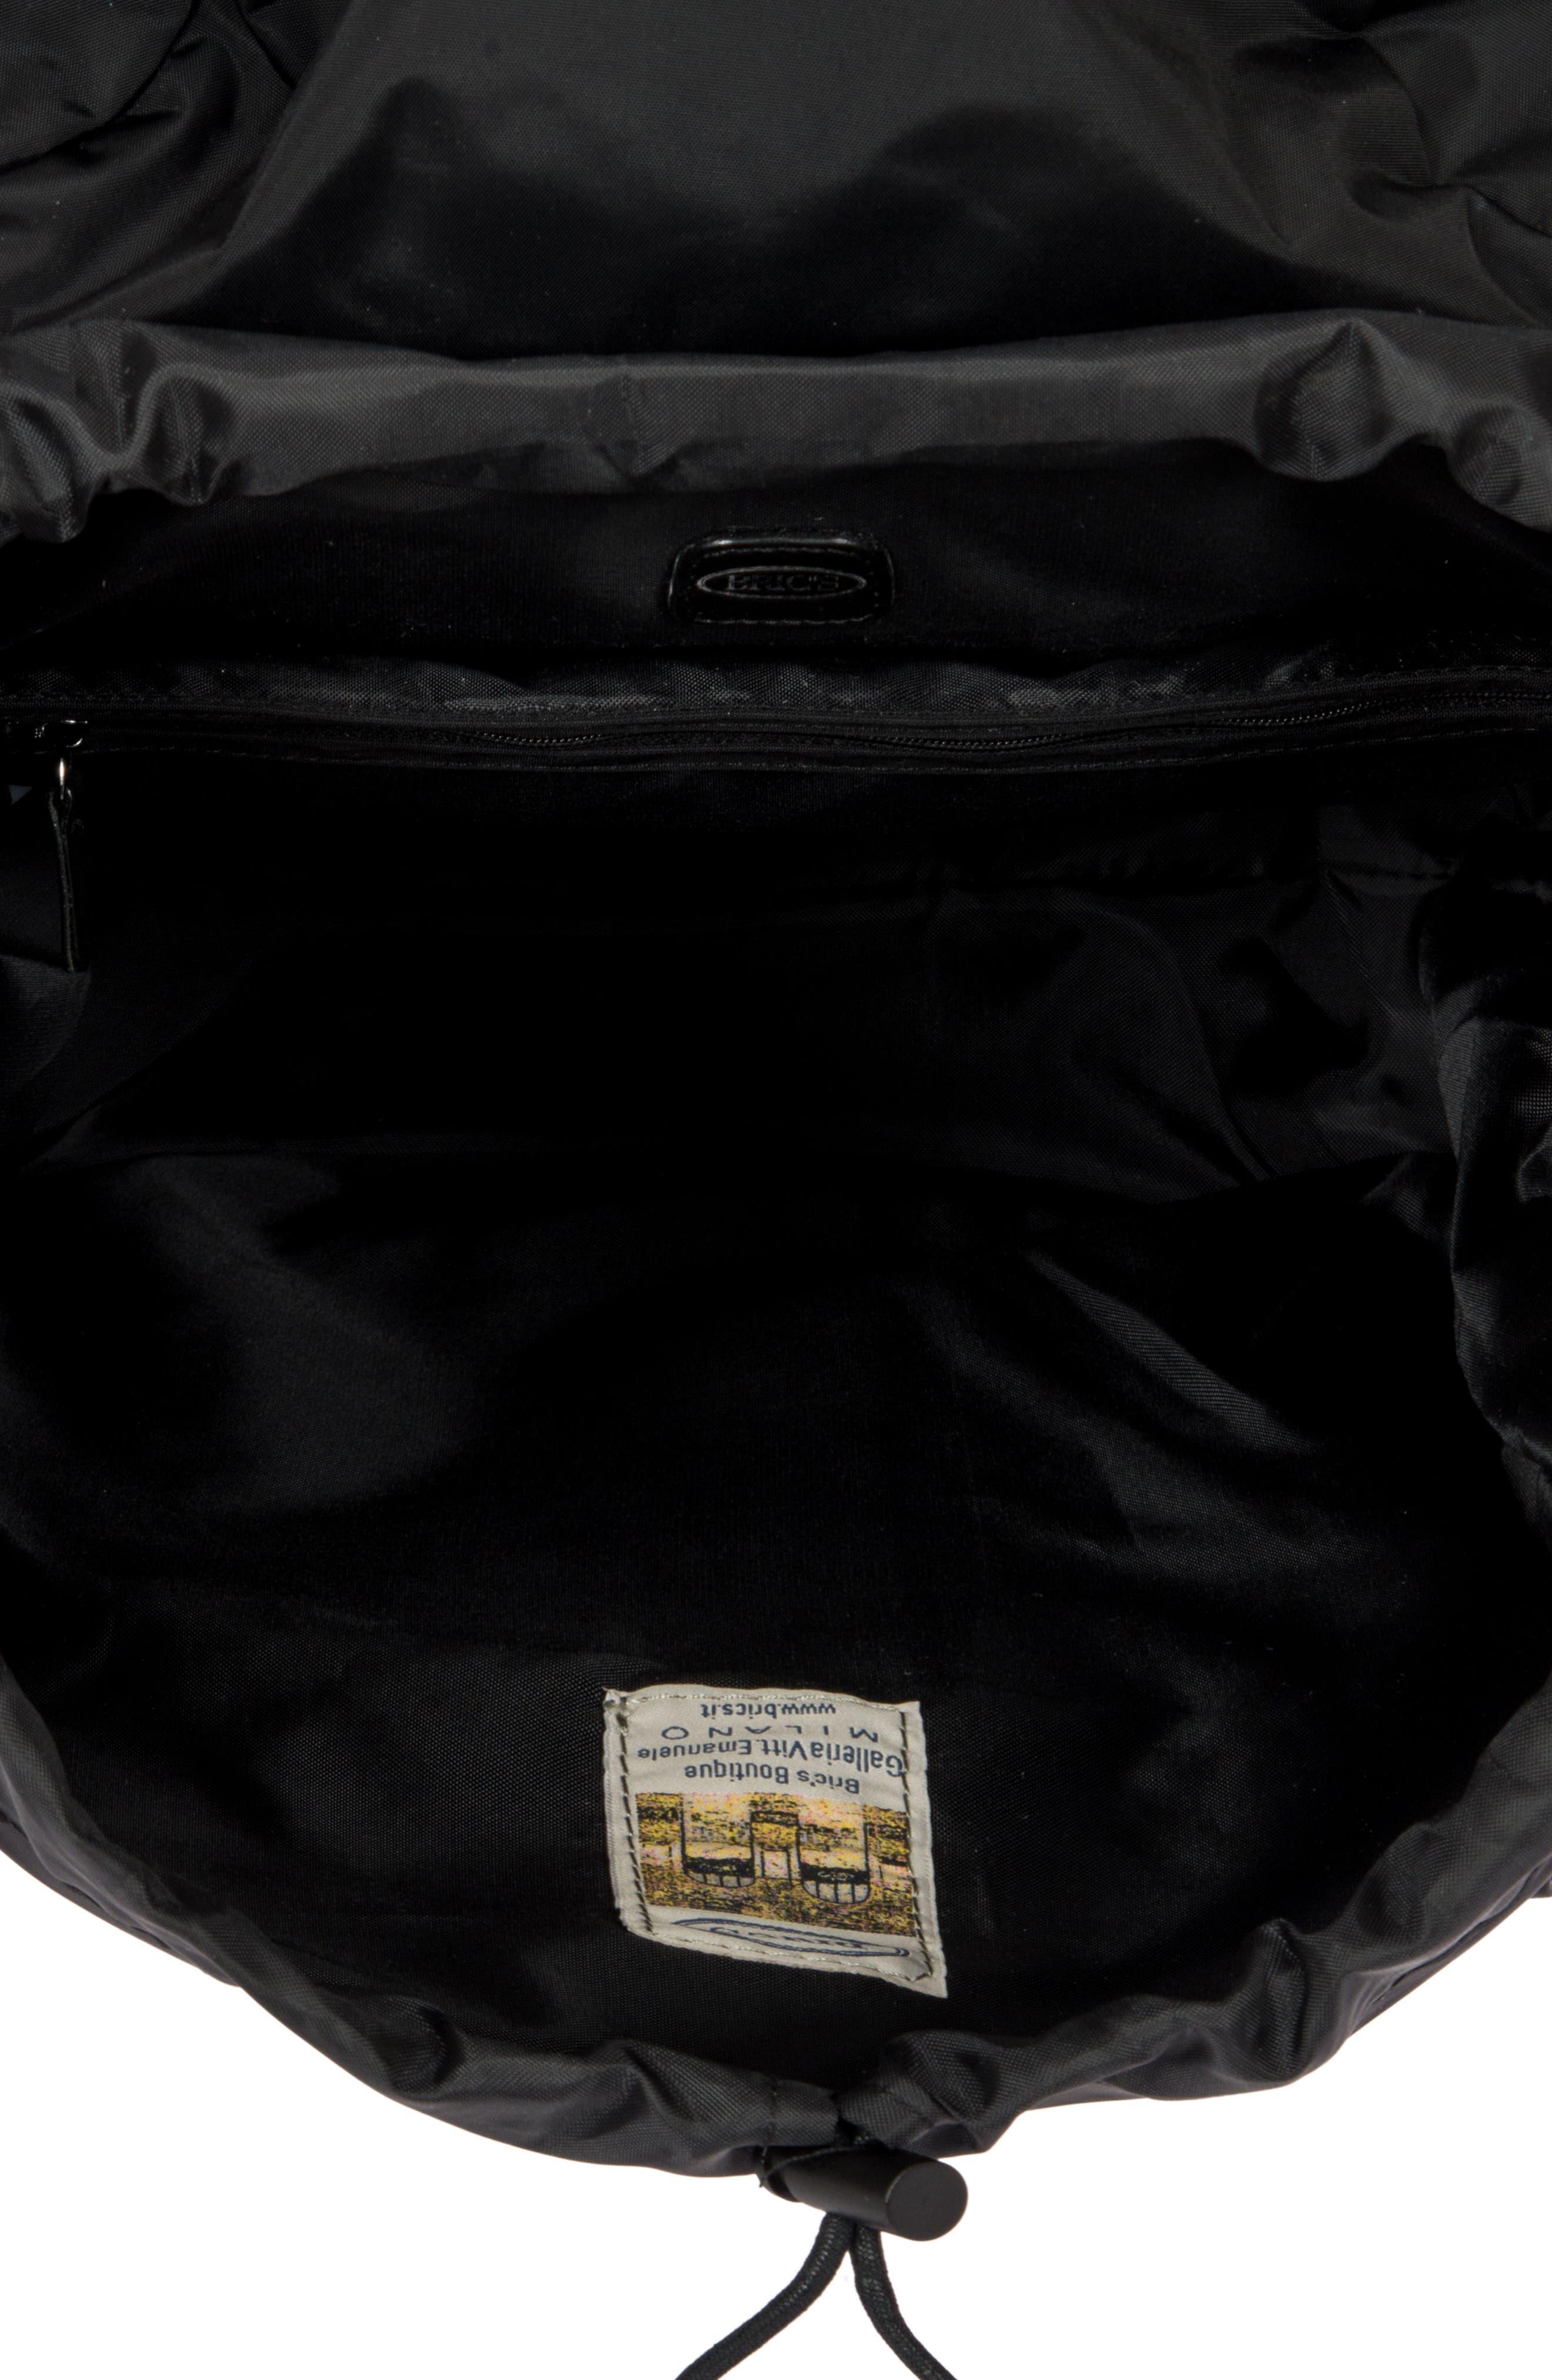 X-Bag Travel Excursion Backpack,                             Alternate thumbnail 3, color,                             BLACK/ BLACK